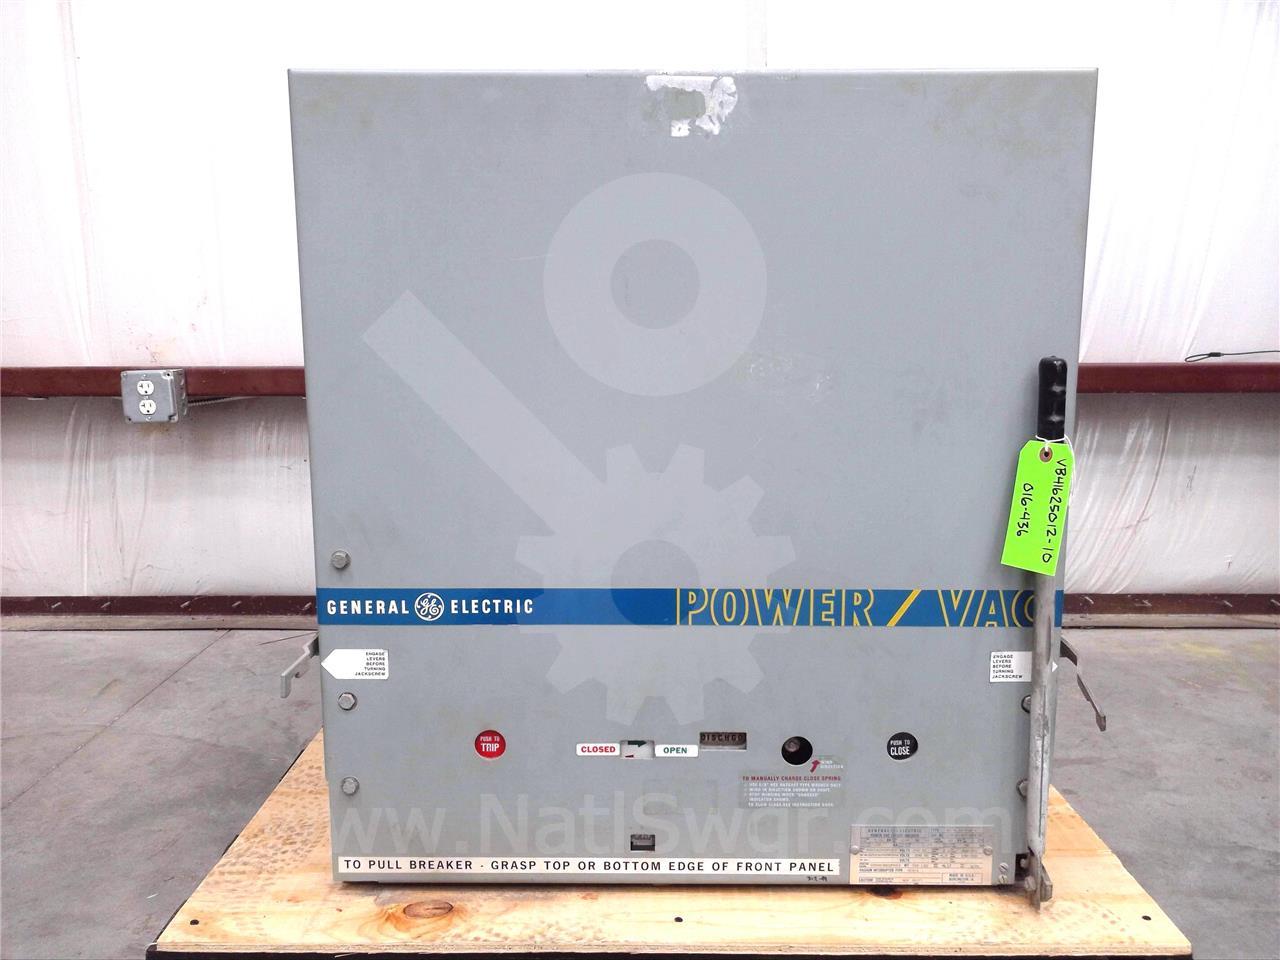 General Electric 1200A GE VB 4.16-250-1 ML-17 (VB 4.16-250)